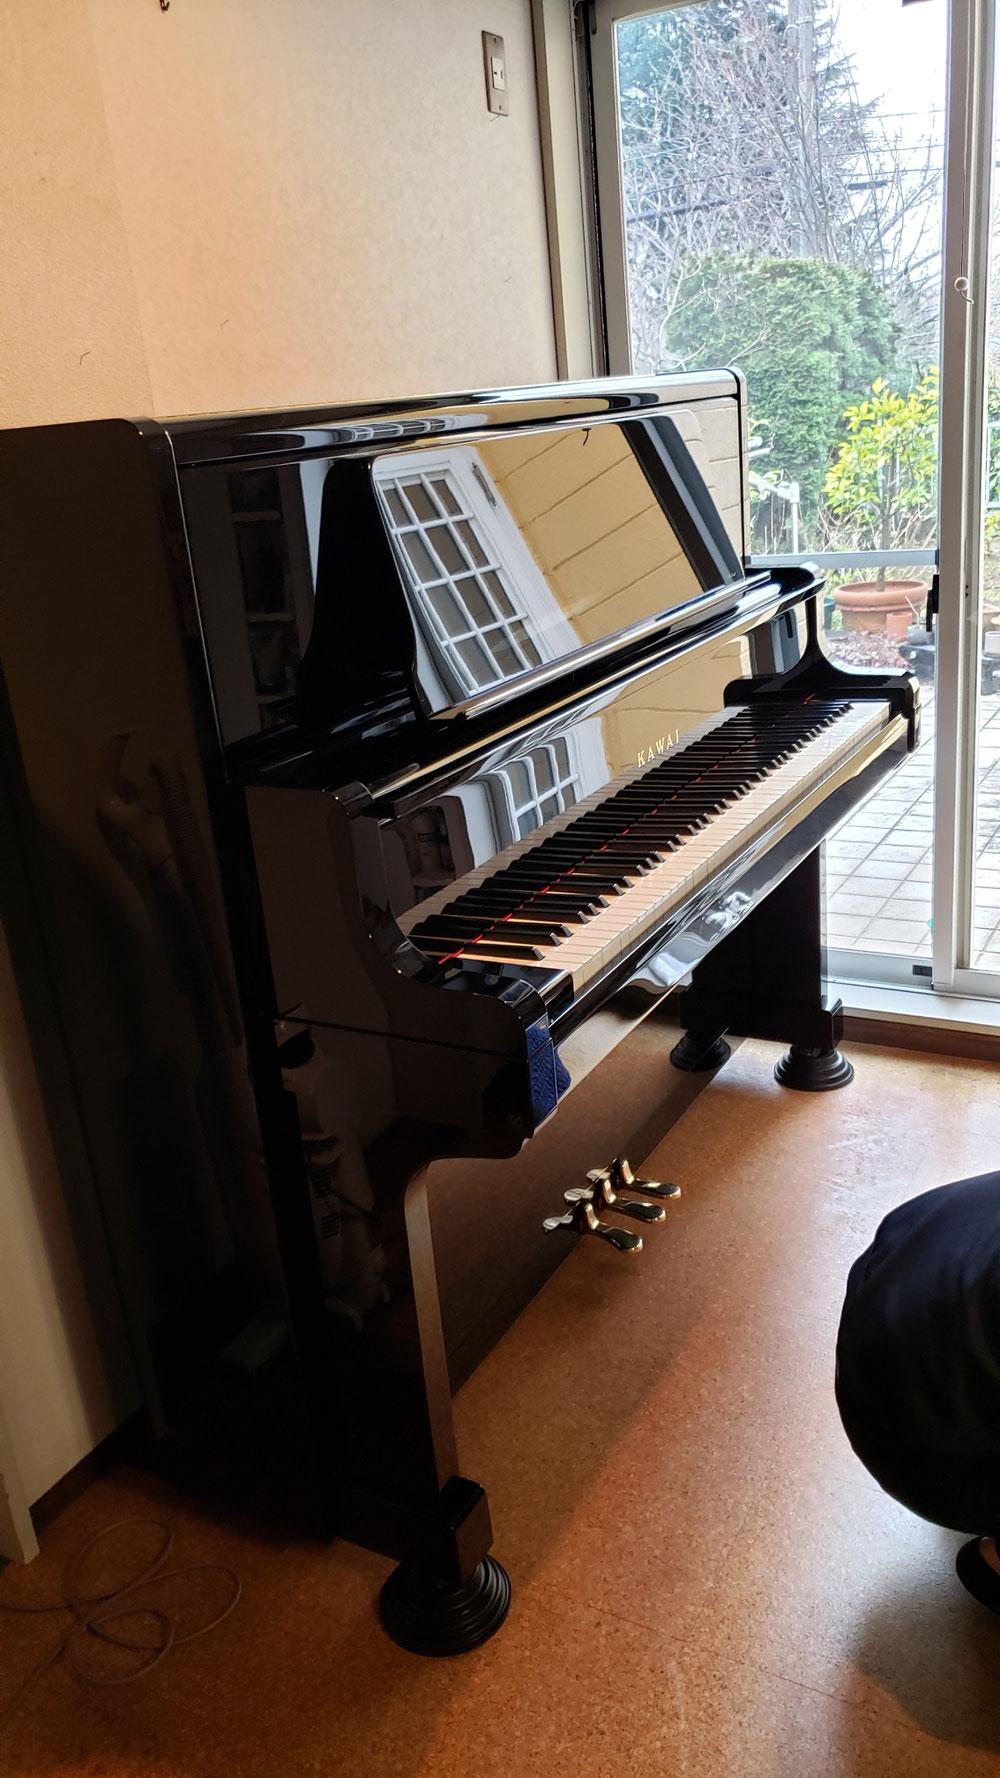 KAWAIのピアノです。まるで現行ピアノです。